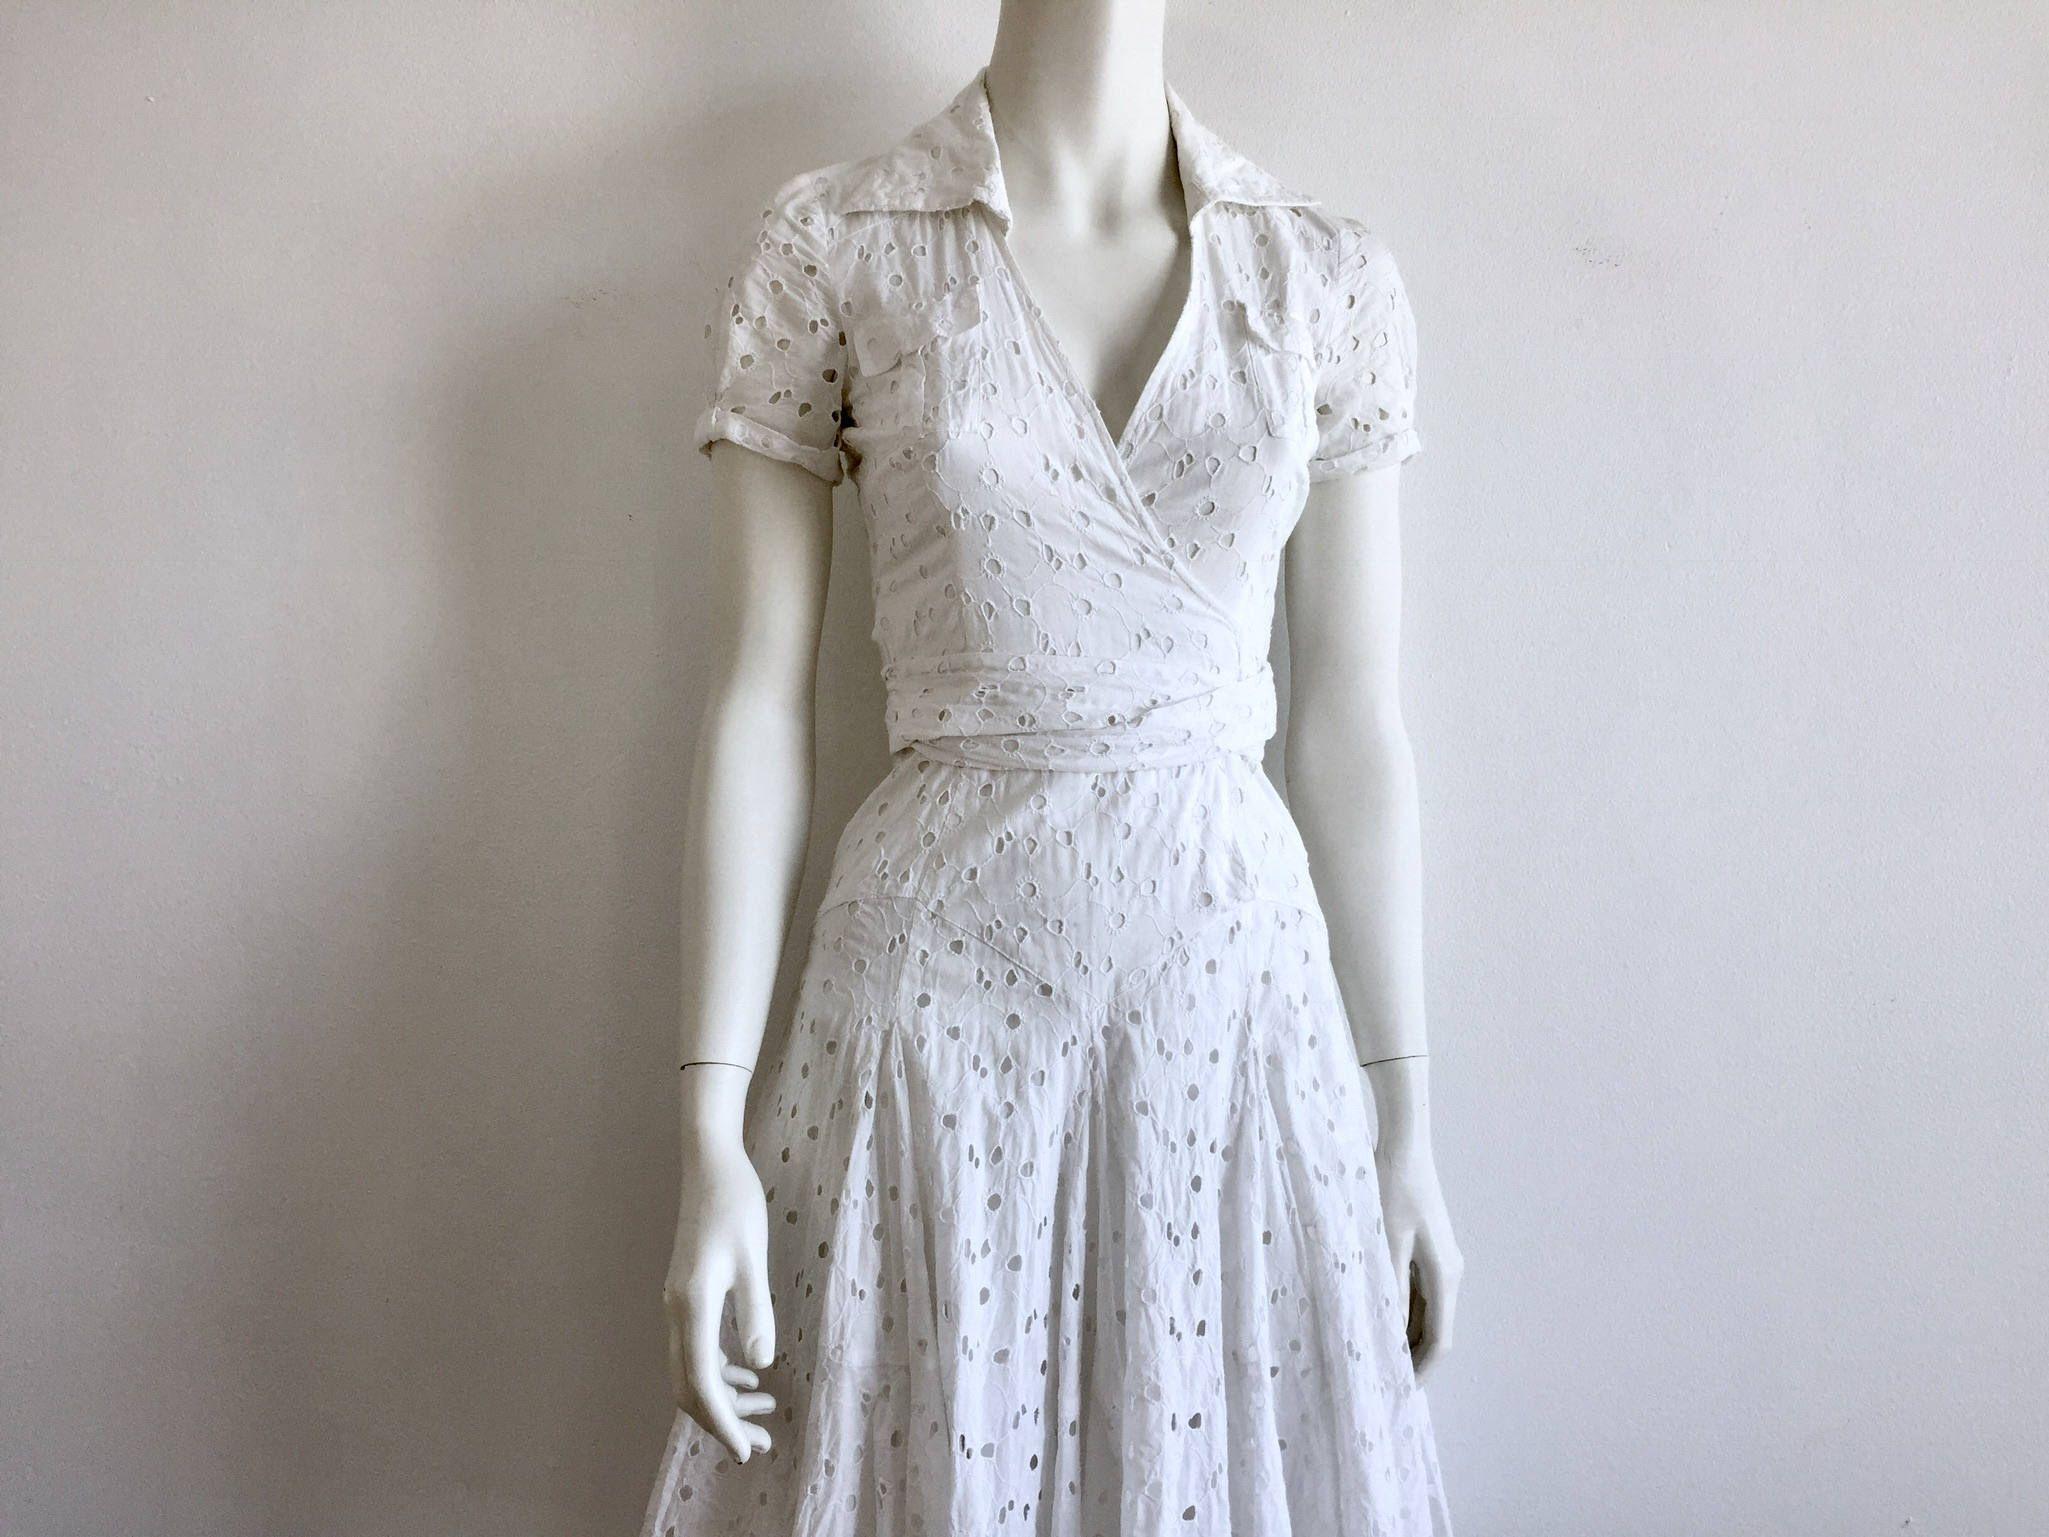 Furstenberg 70 S White Eyelet Shirt Dress Diane Von Furstenberg All Cotton White Wrap Dress Original Dvf Fluted Skirt Wrap Shirt Dress Wrap Shirt Dress White Wrap Dress White Eyelet [ 1537 x 2049 Pixel ]